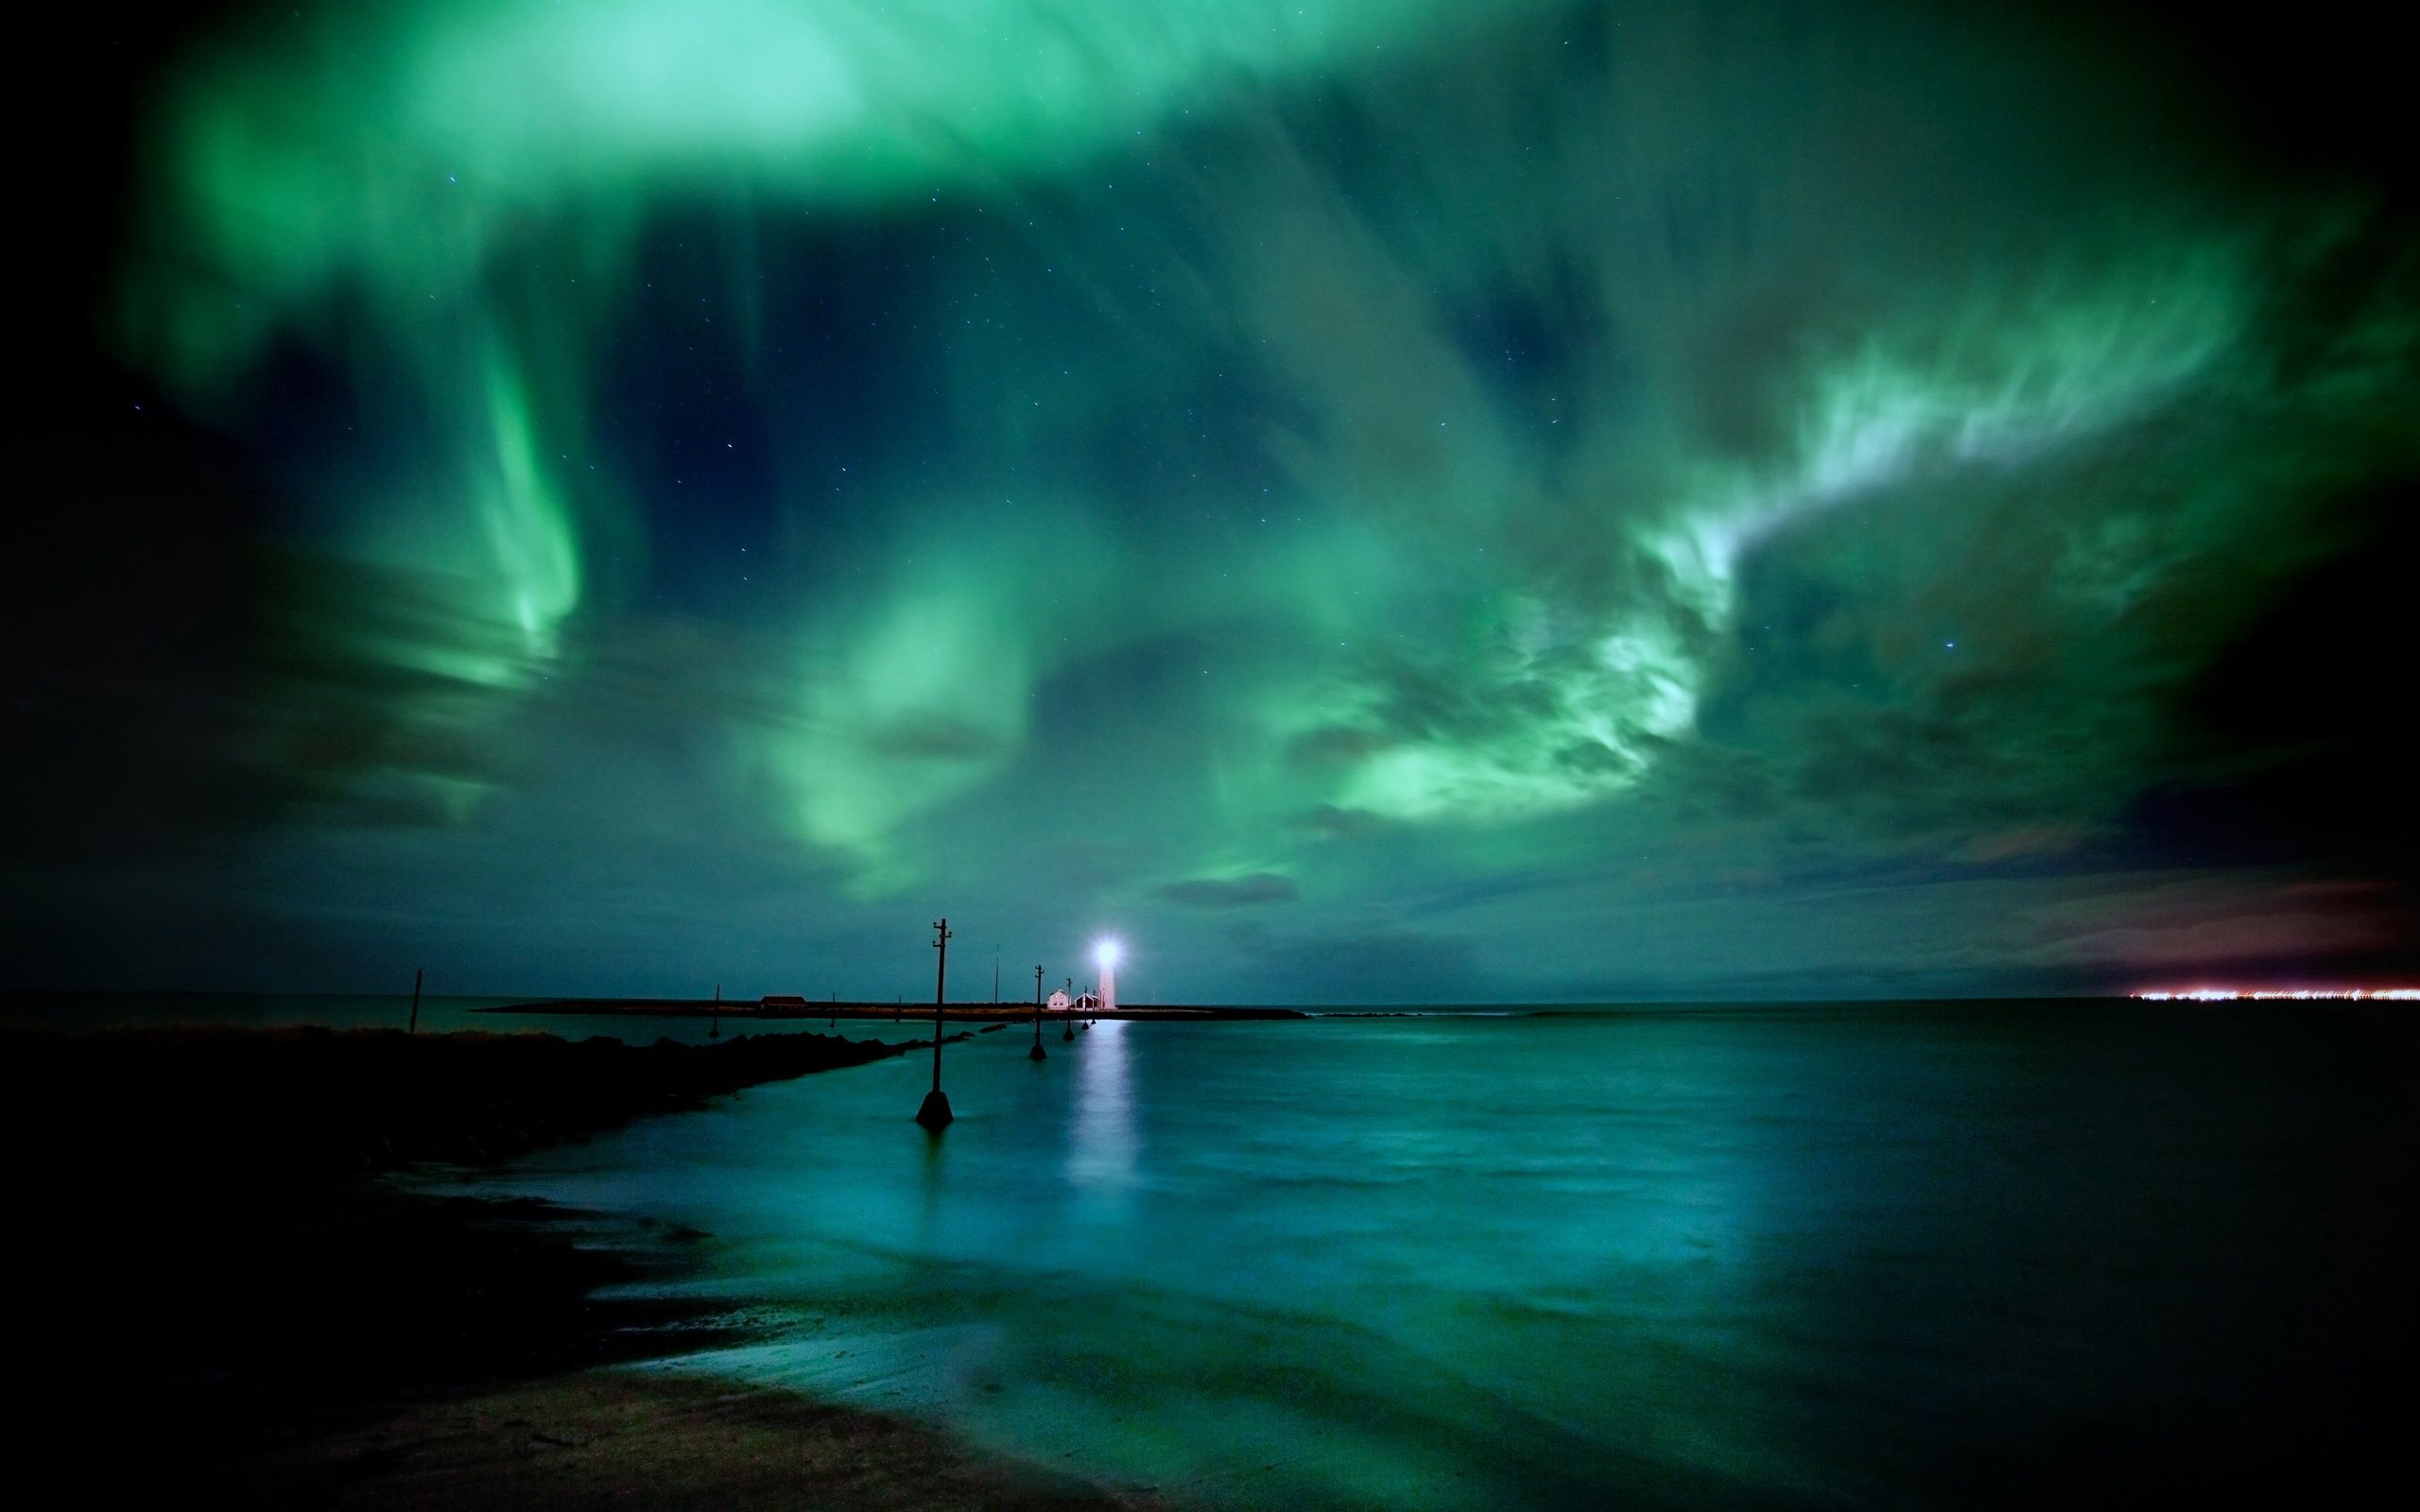 Green Aurora Borealis Northern Lights (click to view)